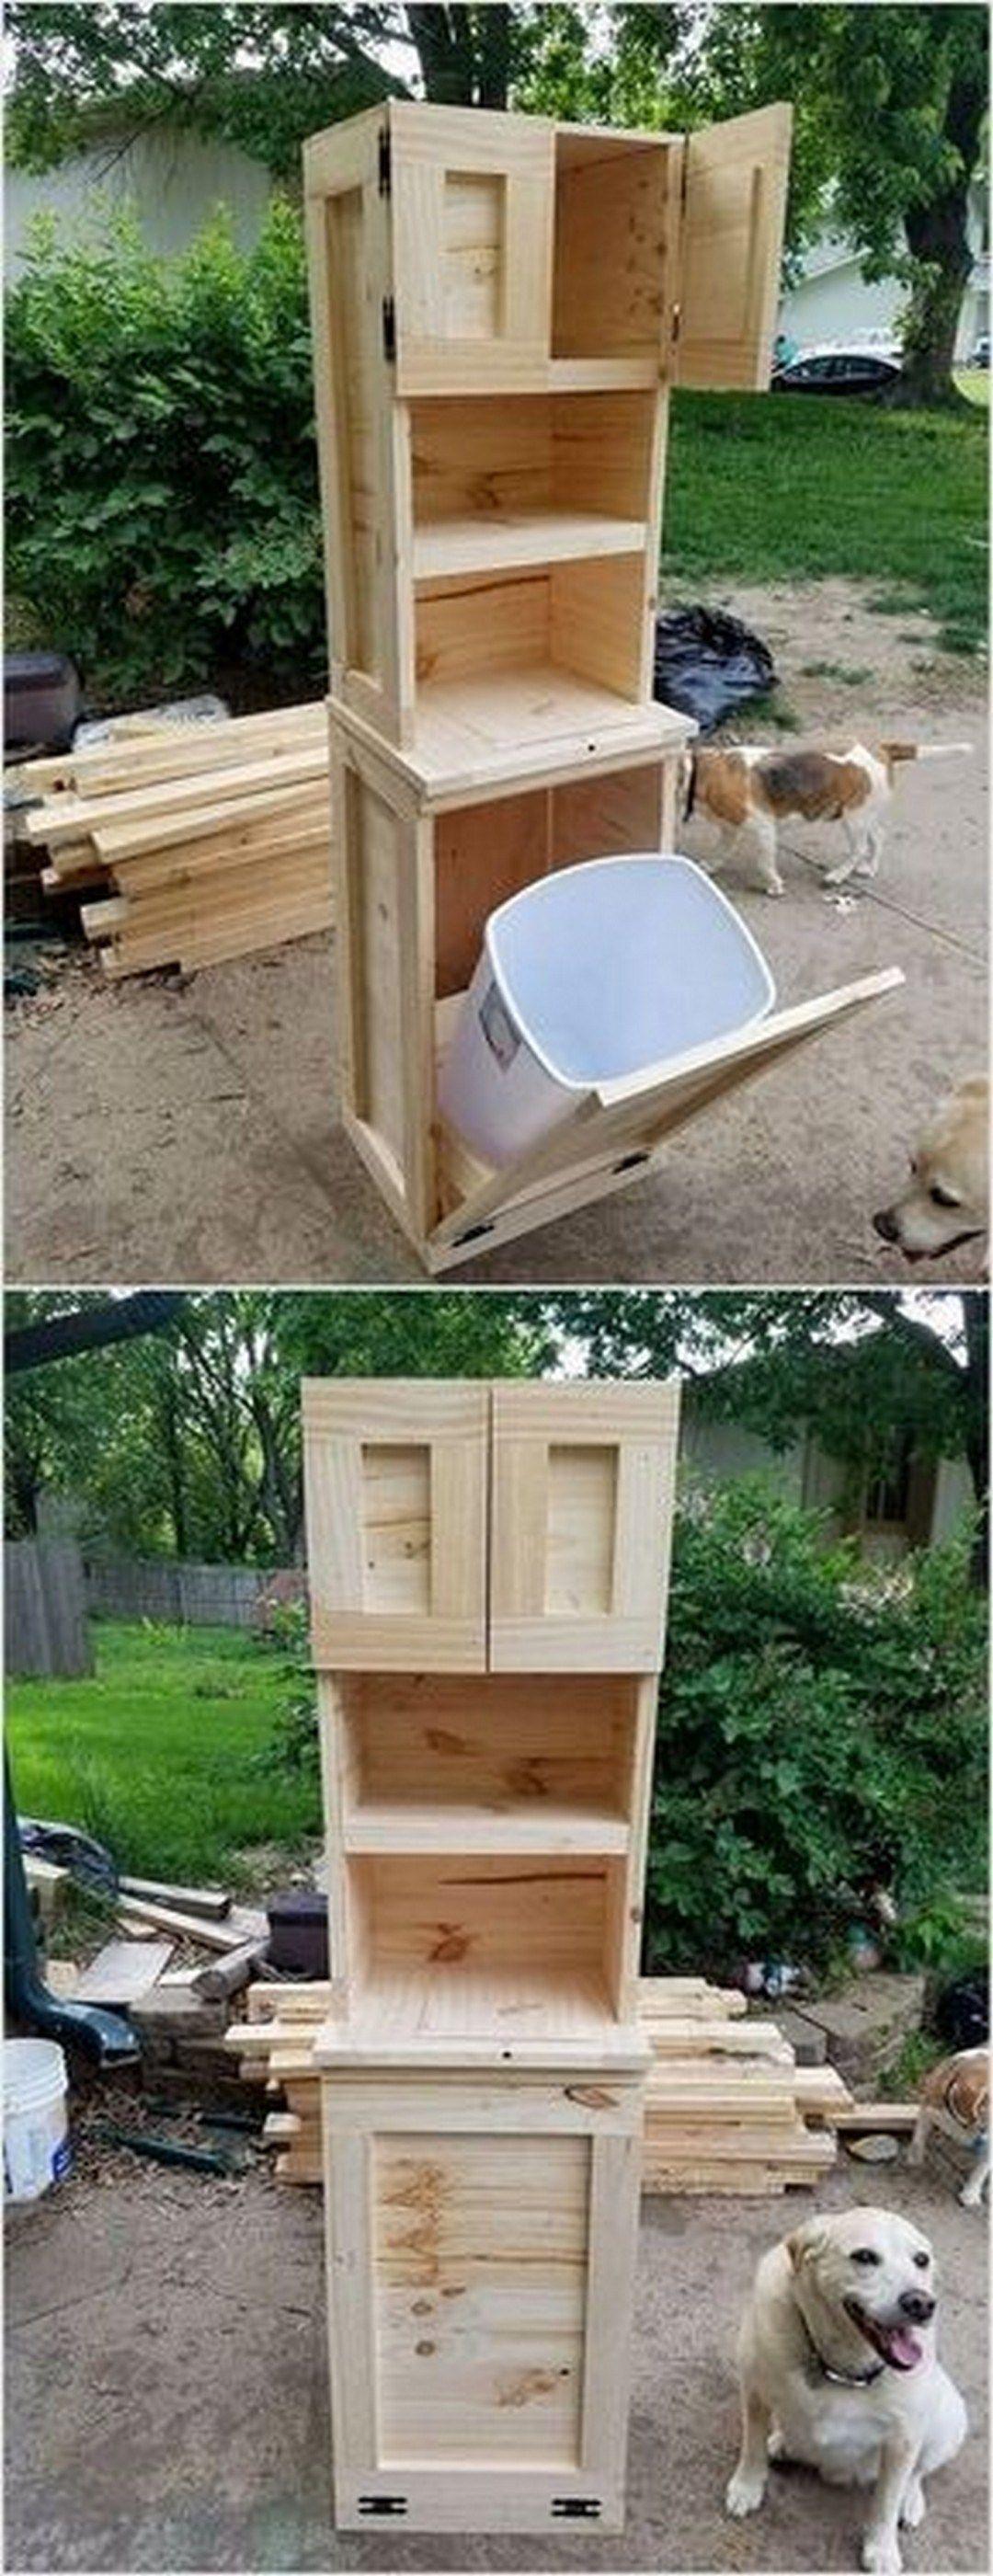 Awesome DIY Pallet Furniture Design Ideas (15 #diypalletfurniture